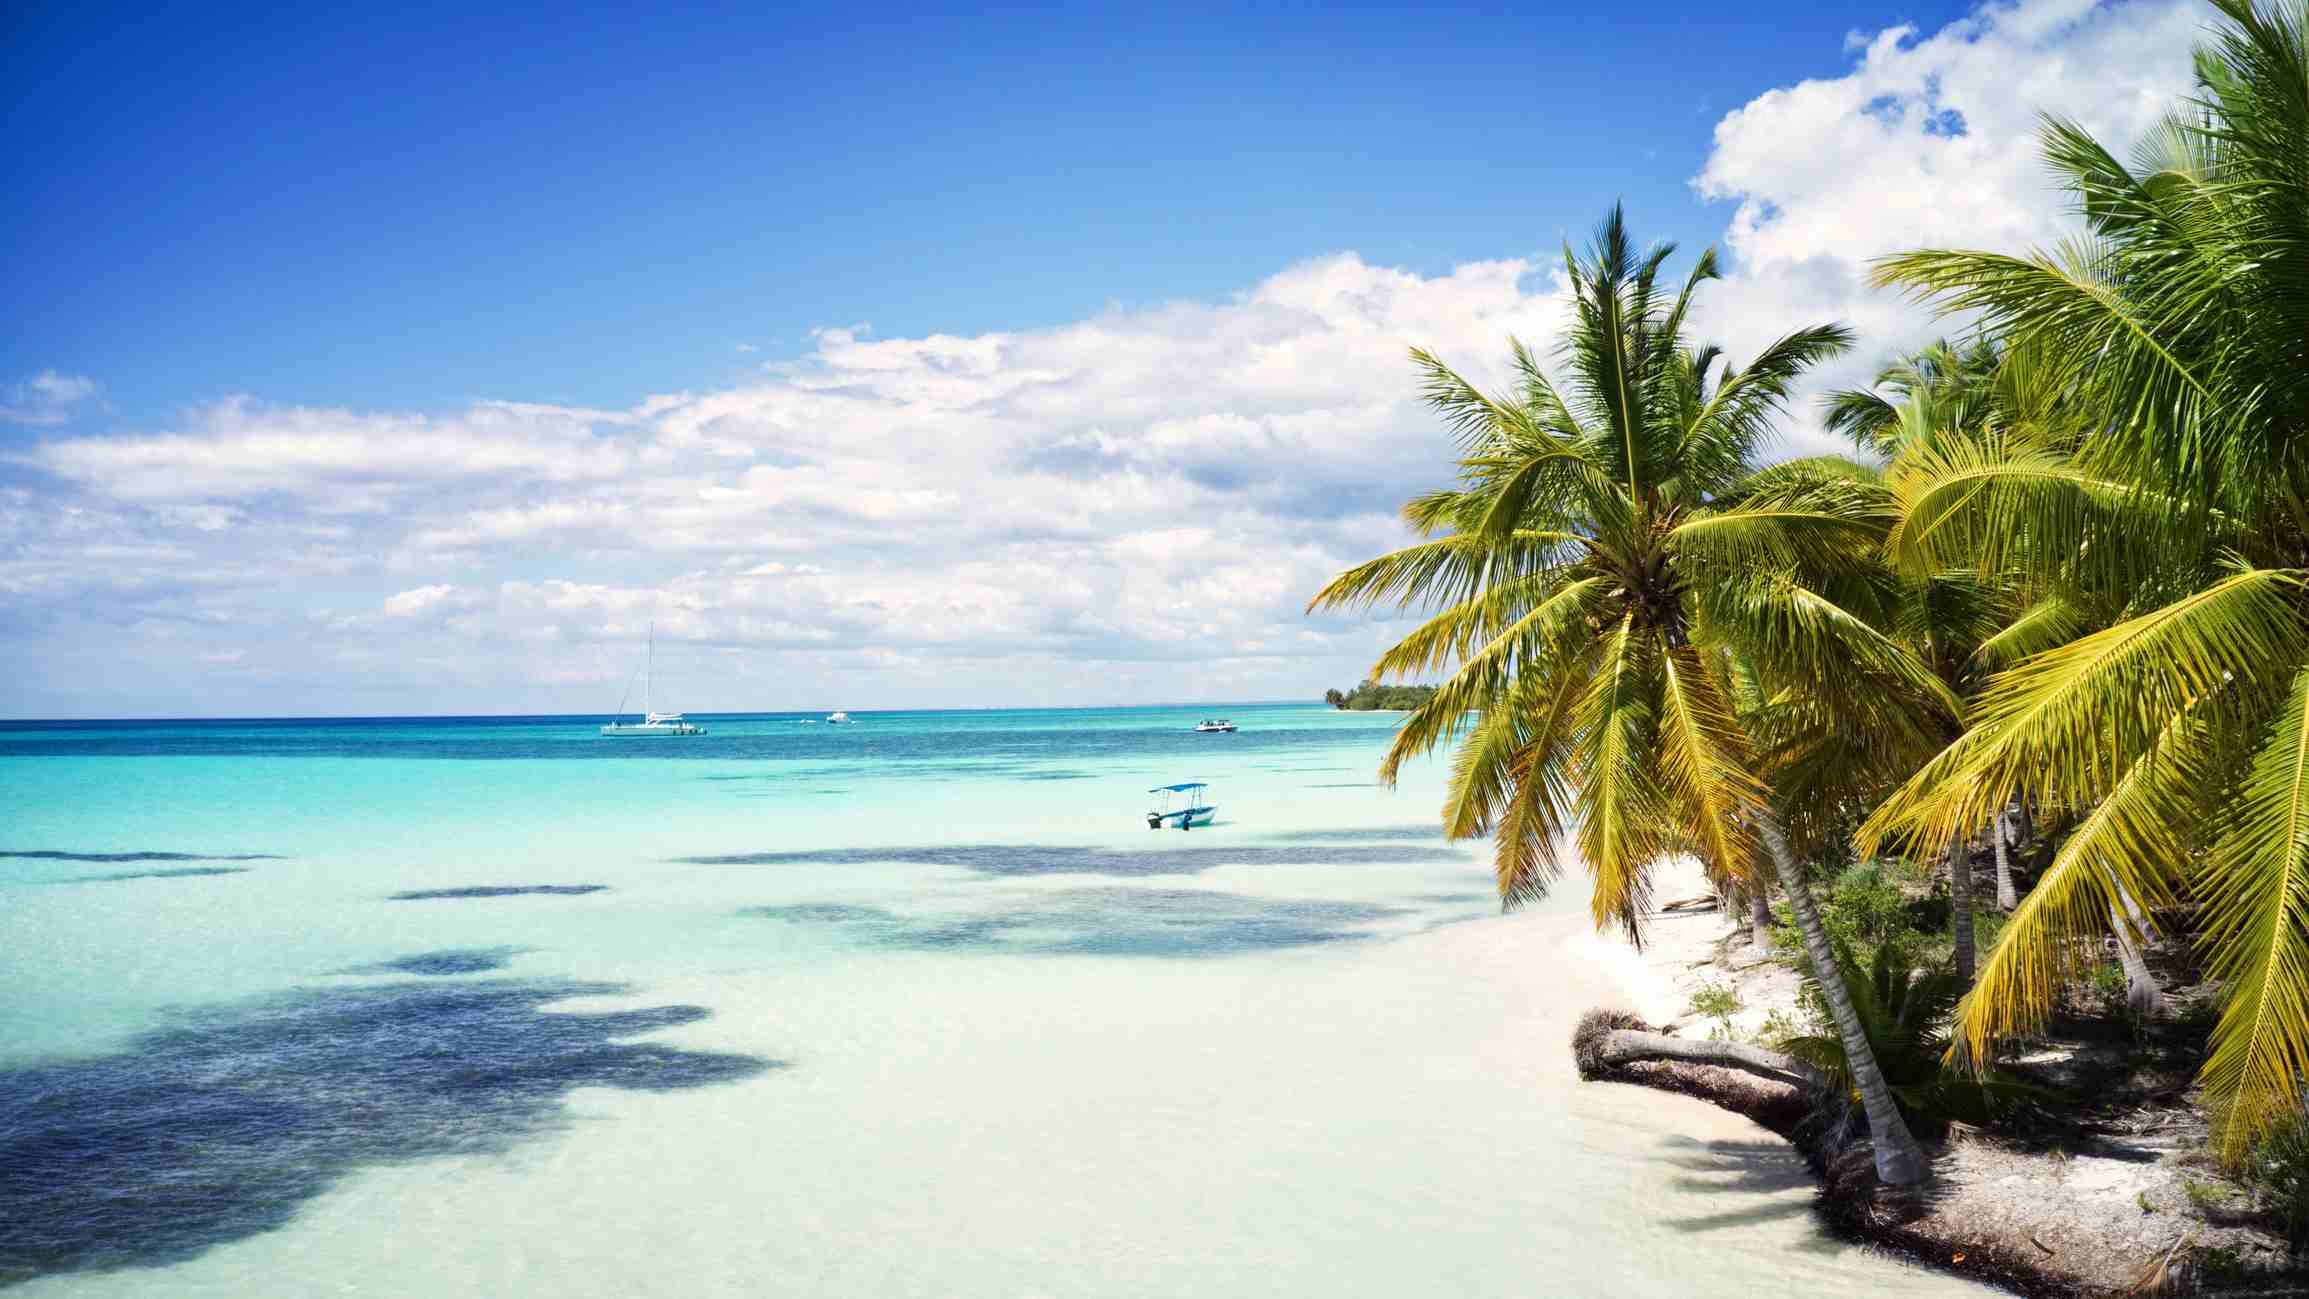 aerial view of a beautiful caribbean island, Saona, Dominican Republic